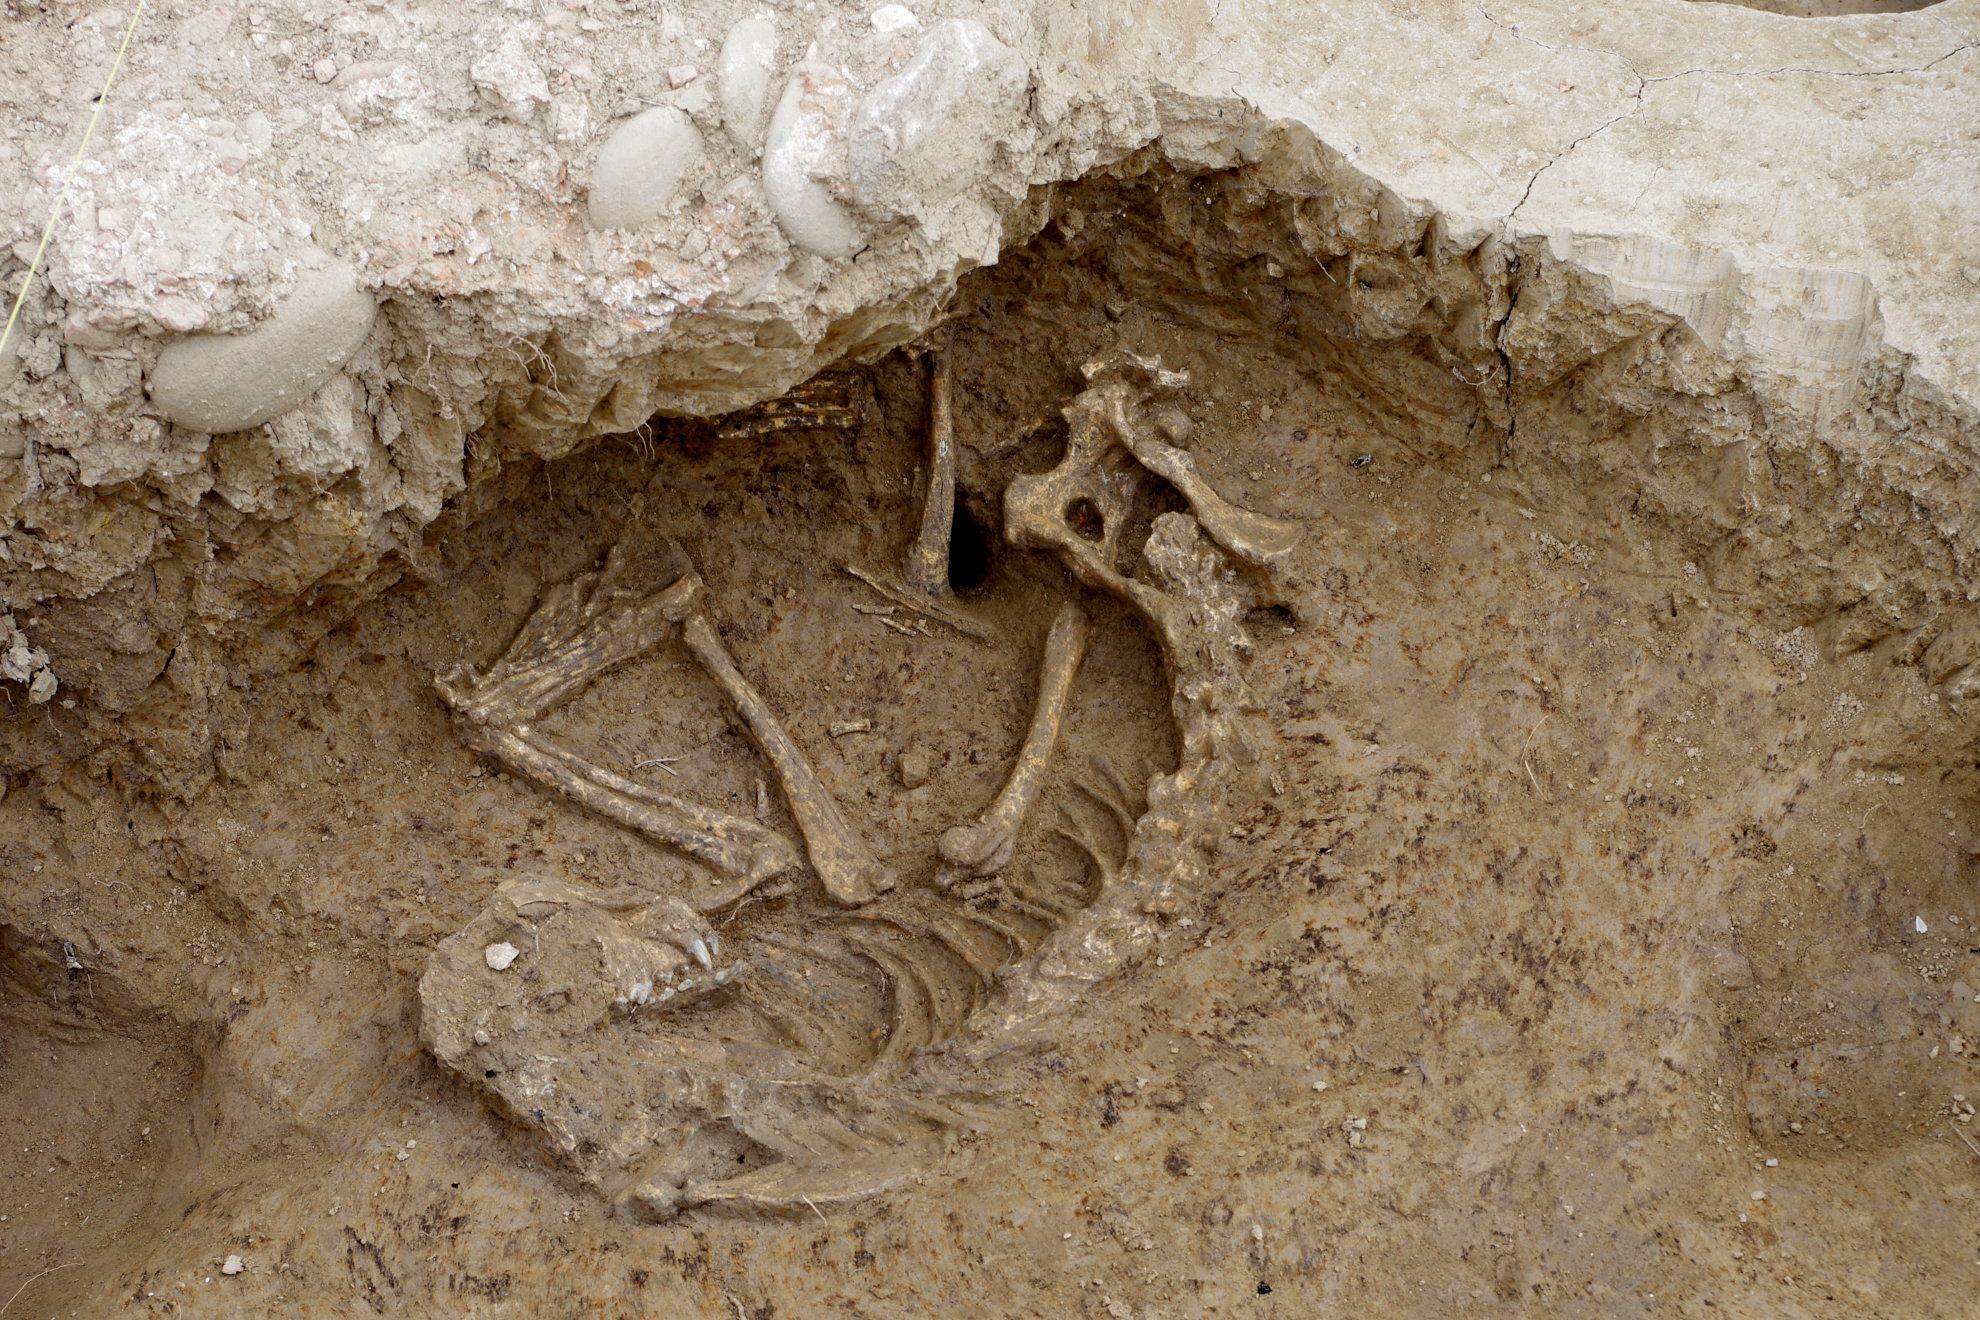 Cane sacrificato, dagli scavi archeologici emergono i resti: era sepolto da 2mila anni